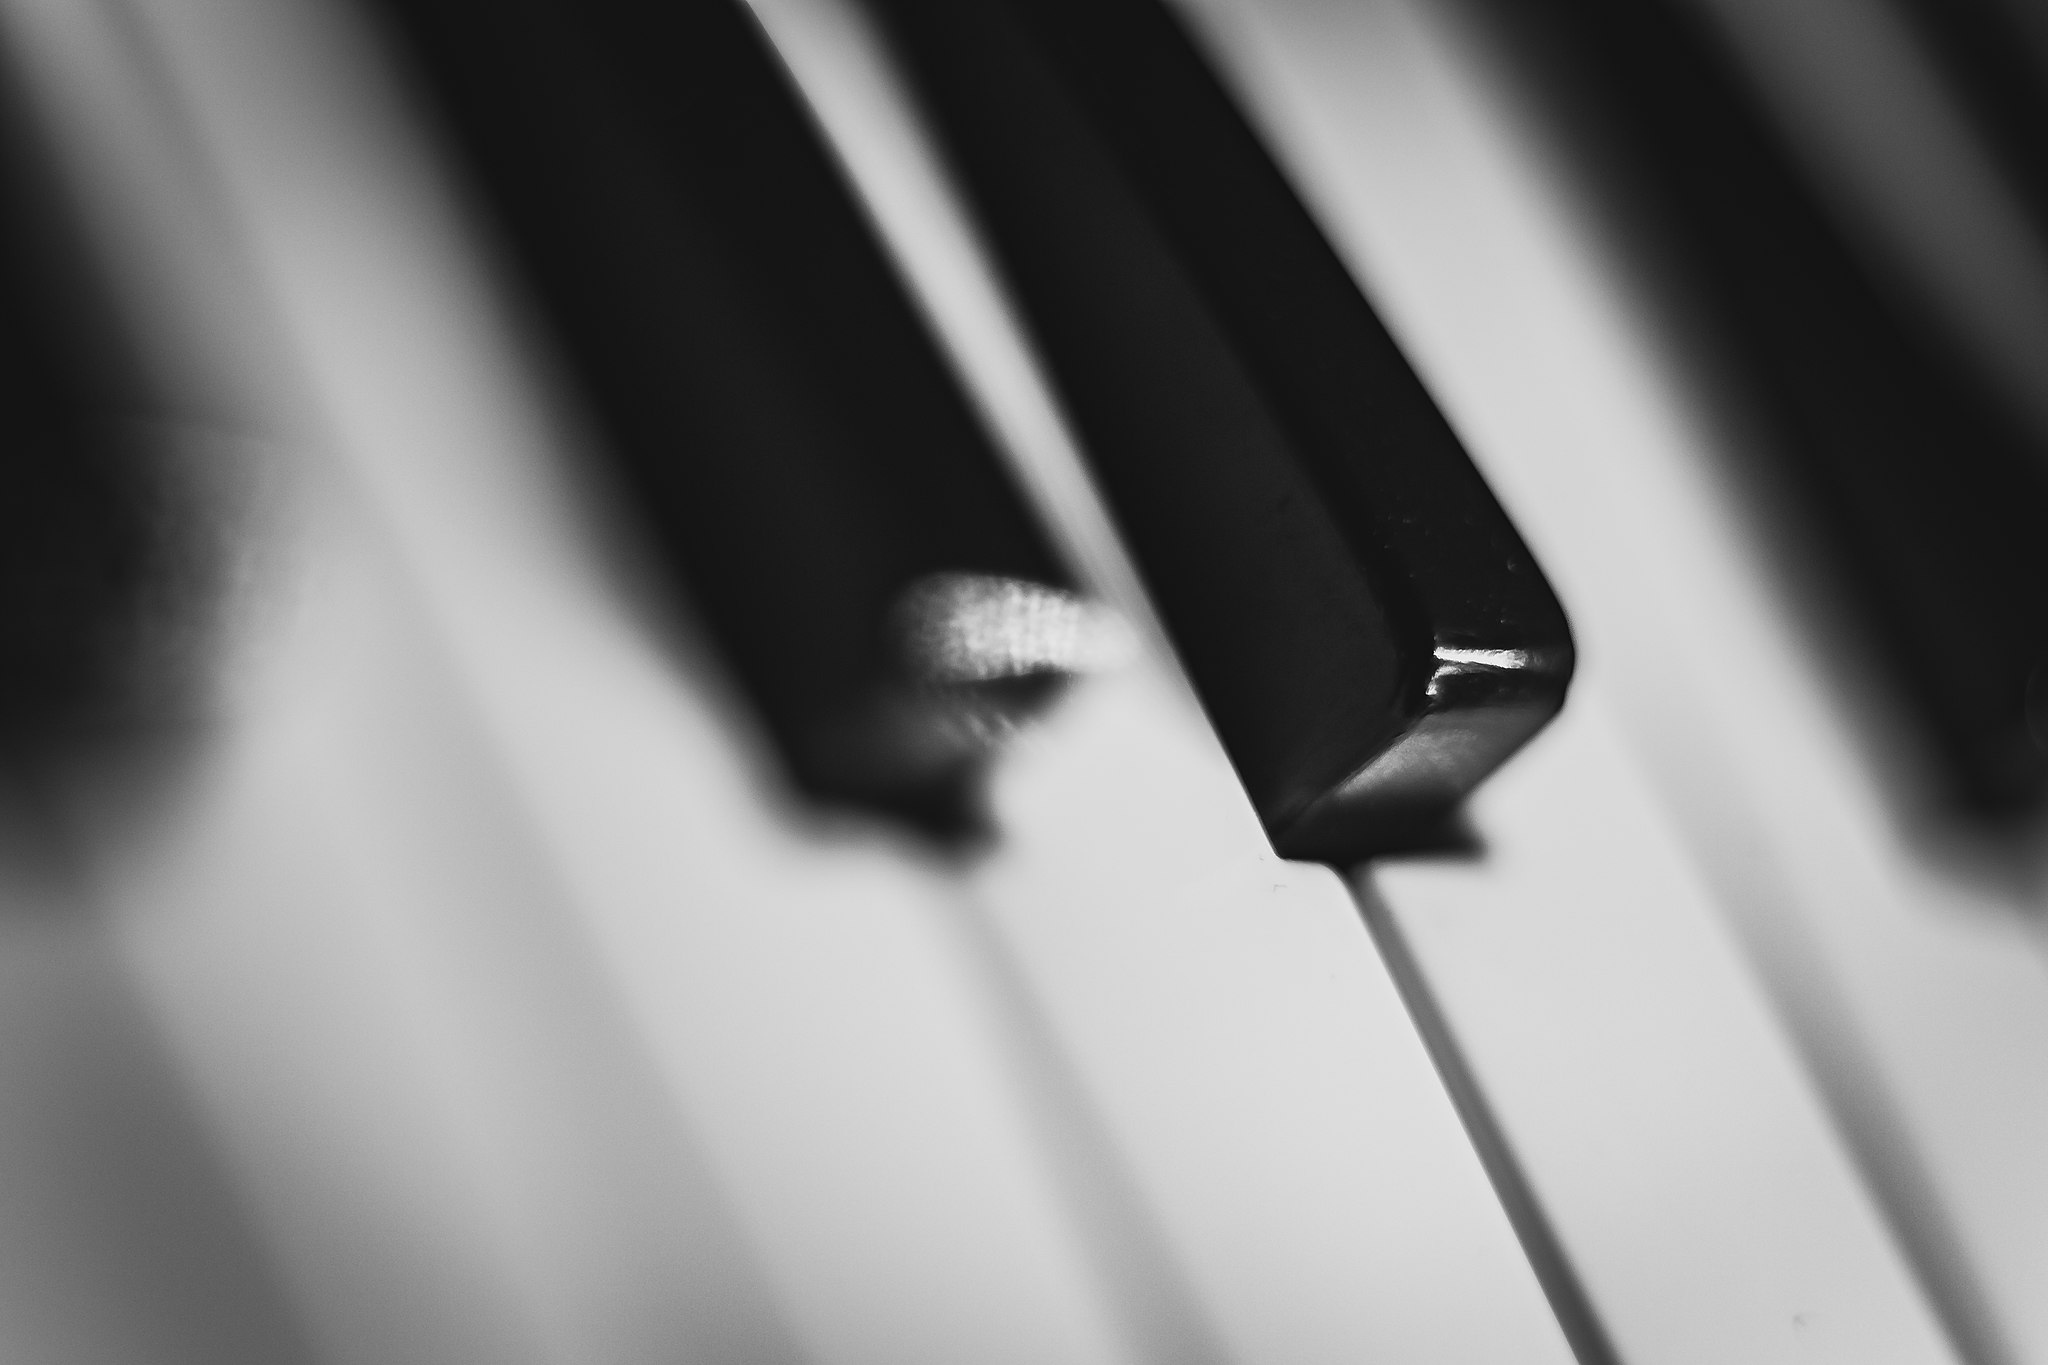 Keys-piano-sh